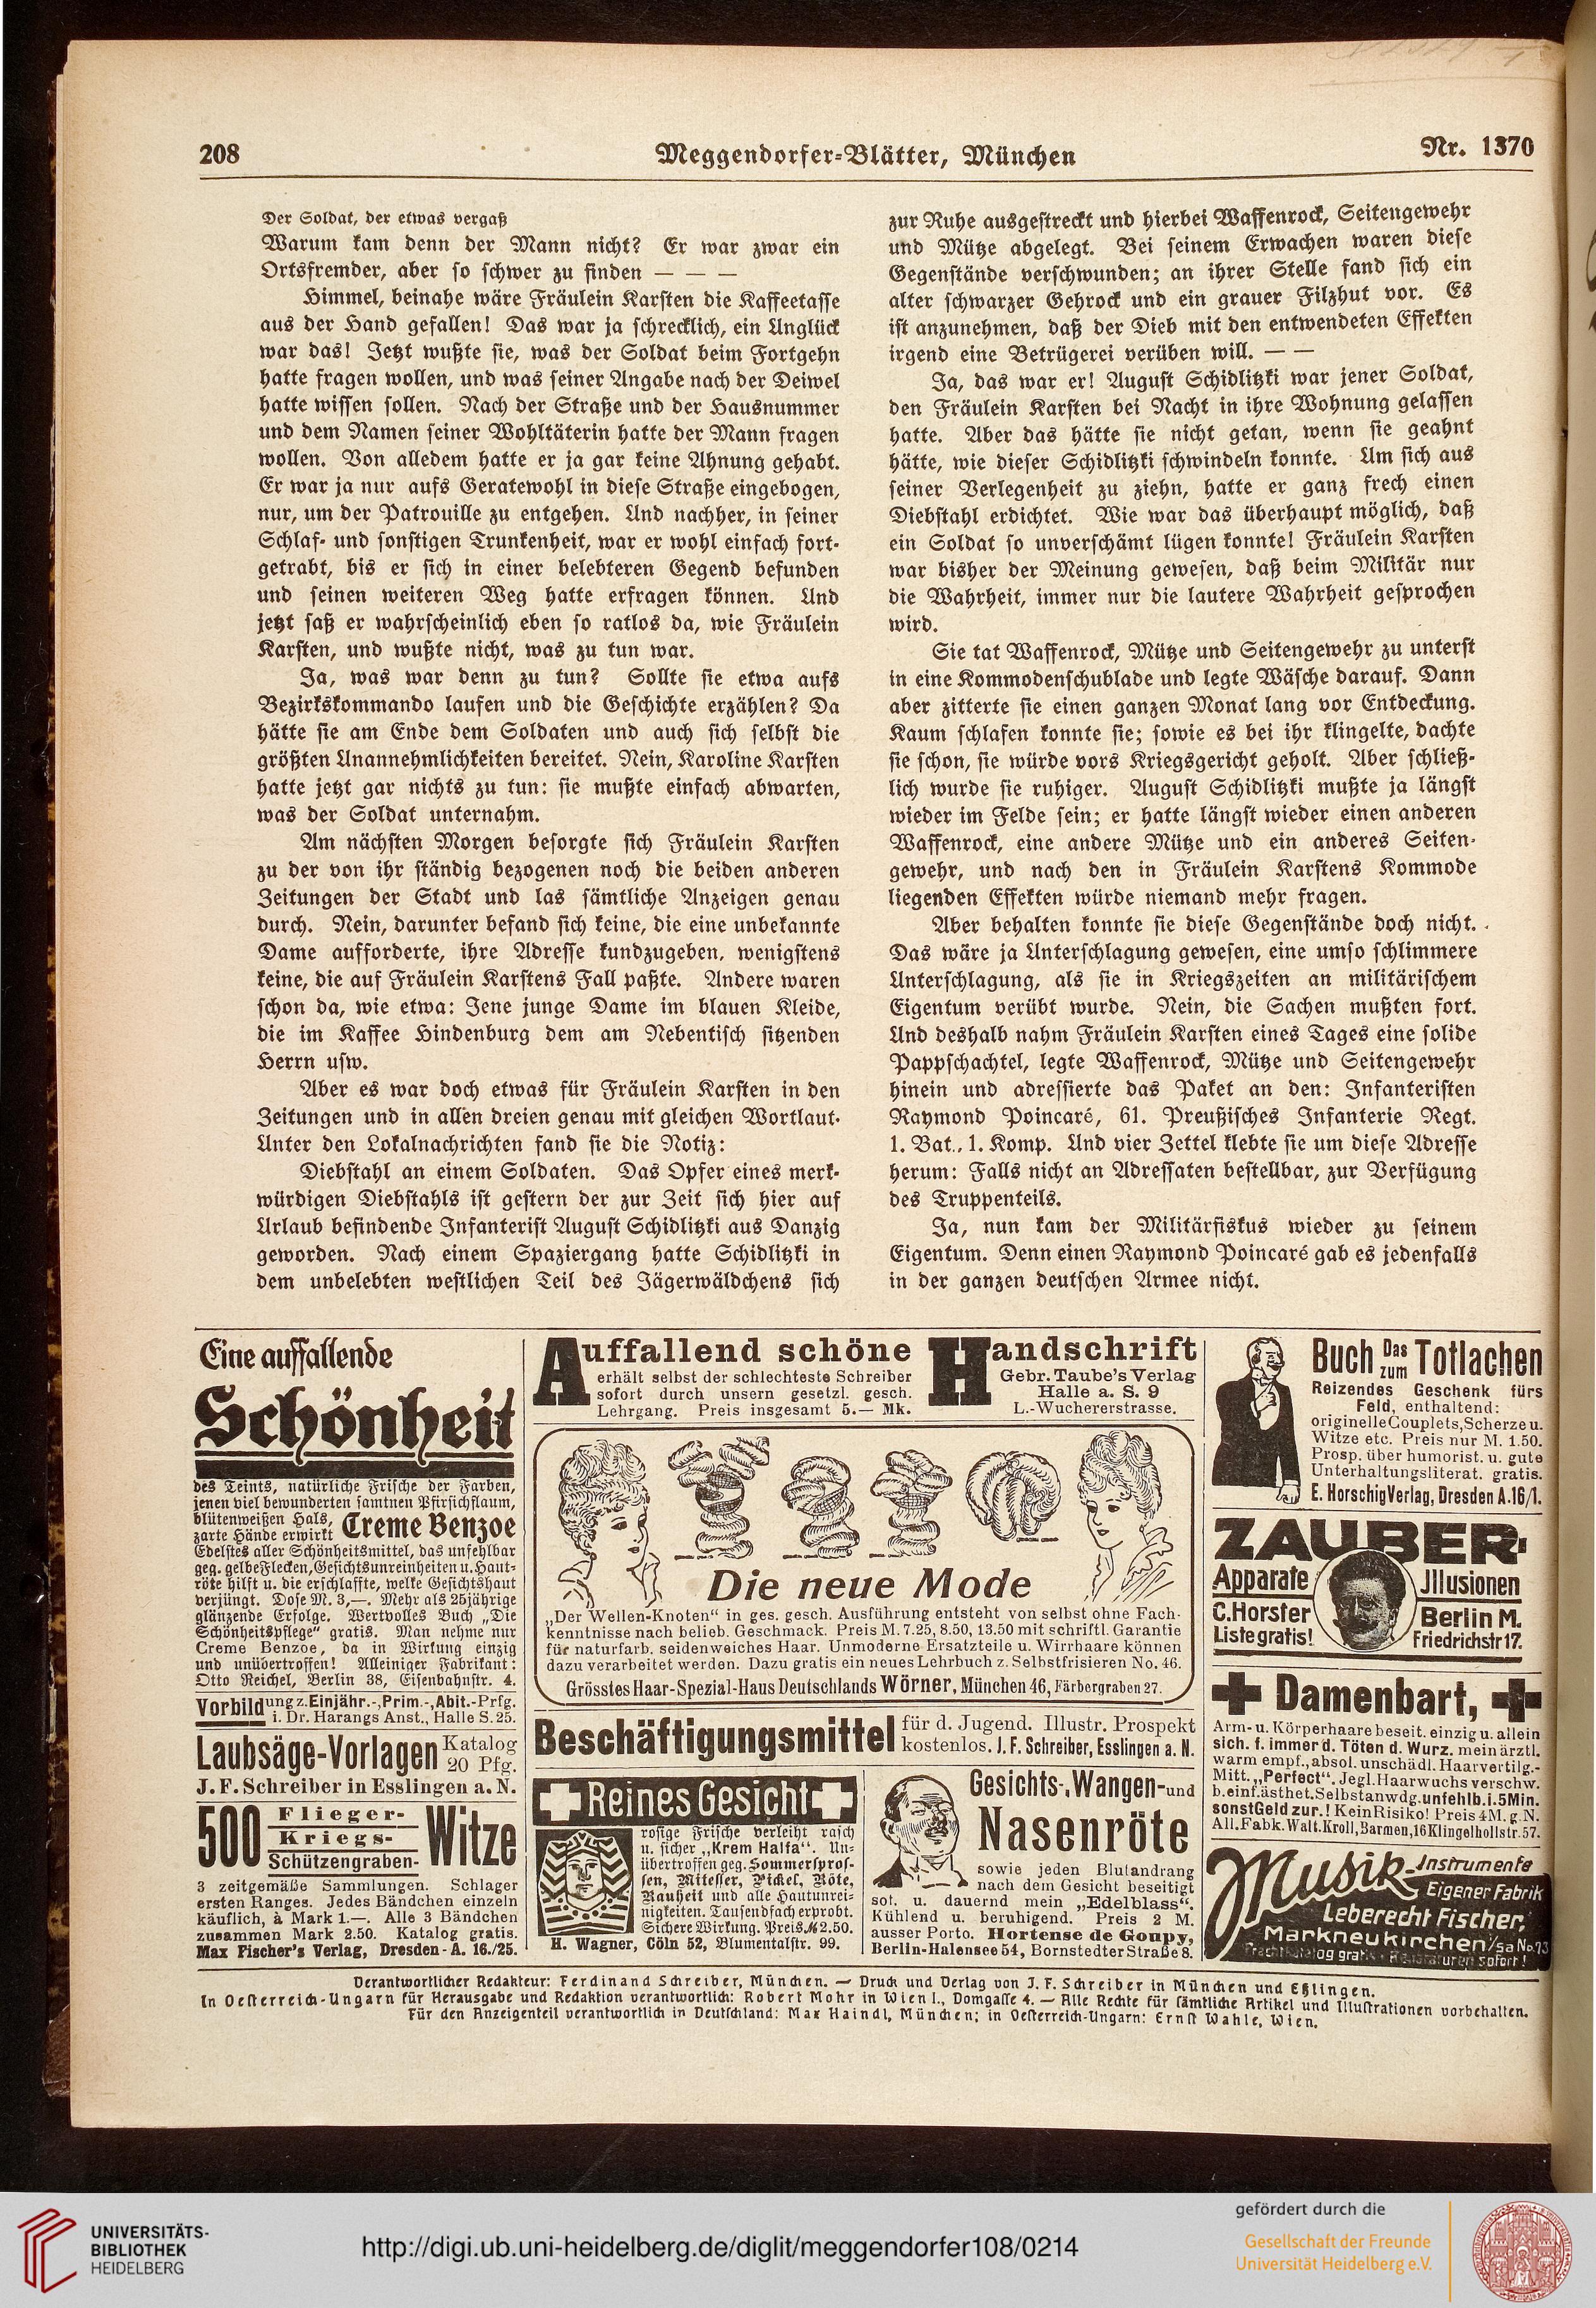 Meggendorfer-Blätter (108.1917 (Nr. 1358-1370))